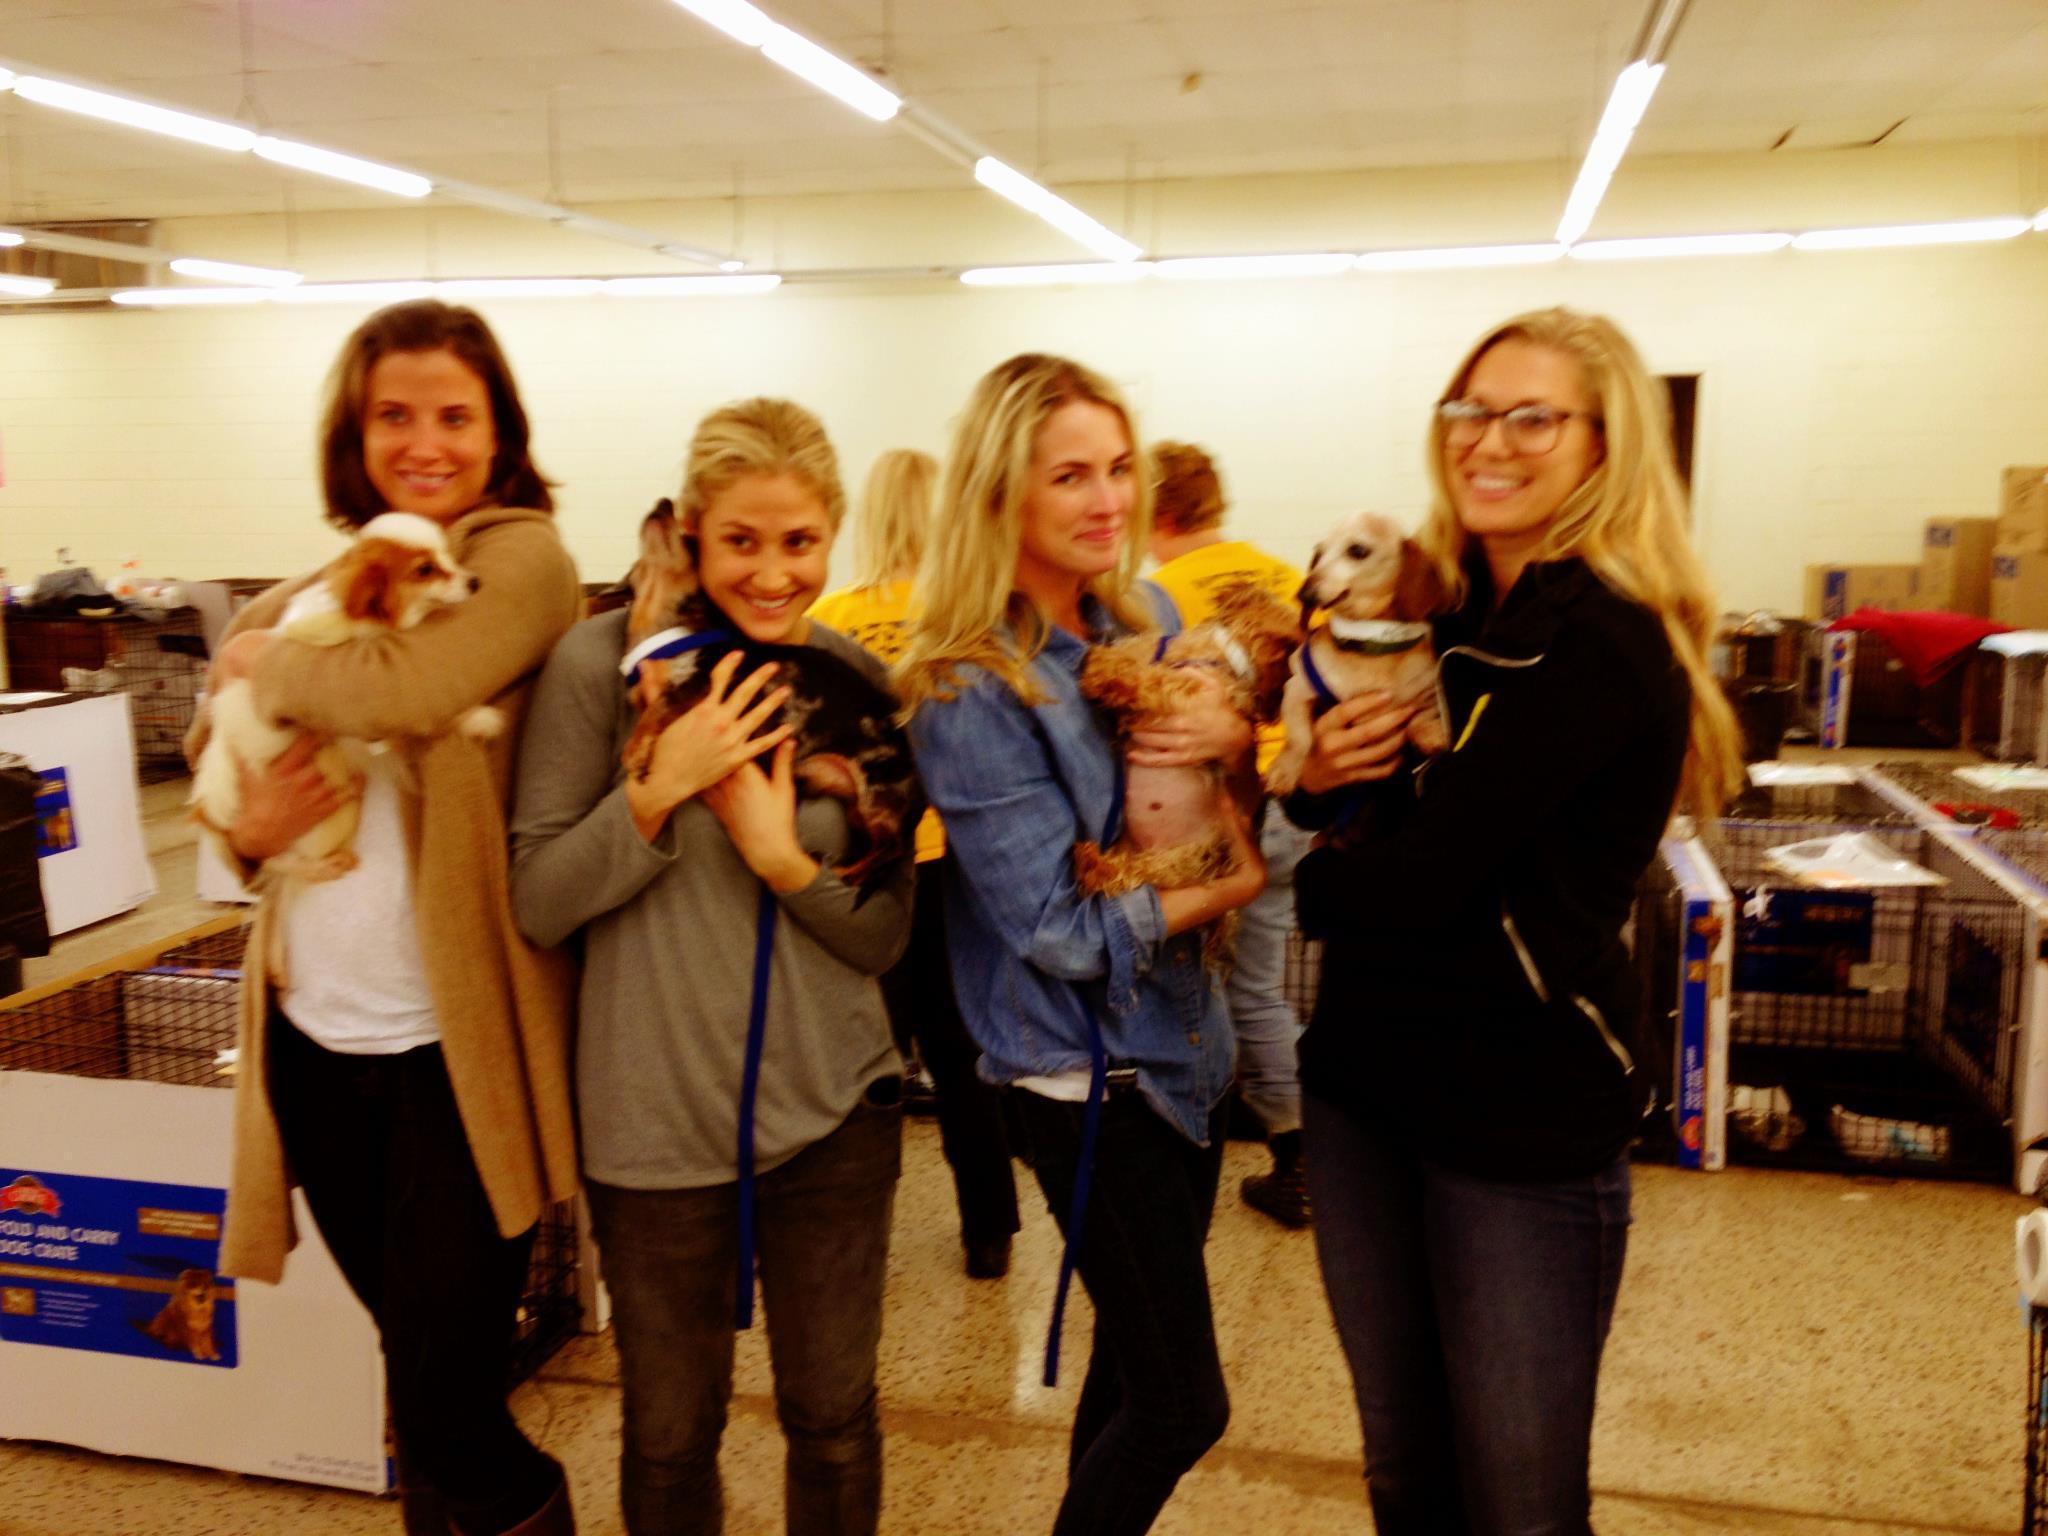 Amanda, Breanna, Lauren Schweibold & Kimberly Ovitz at a puppy mill raid in NC